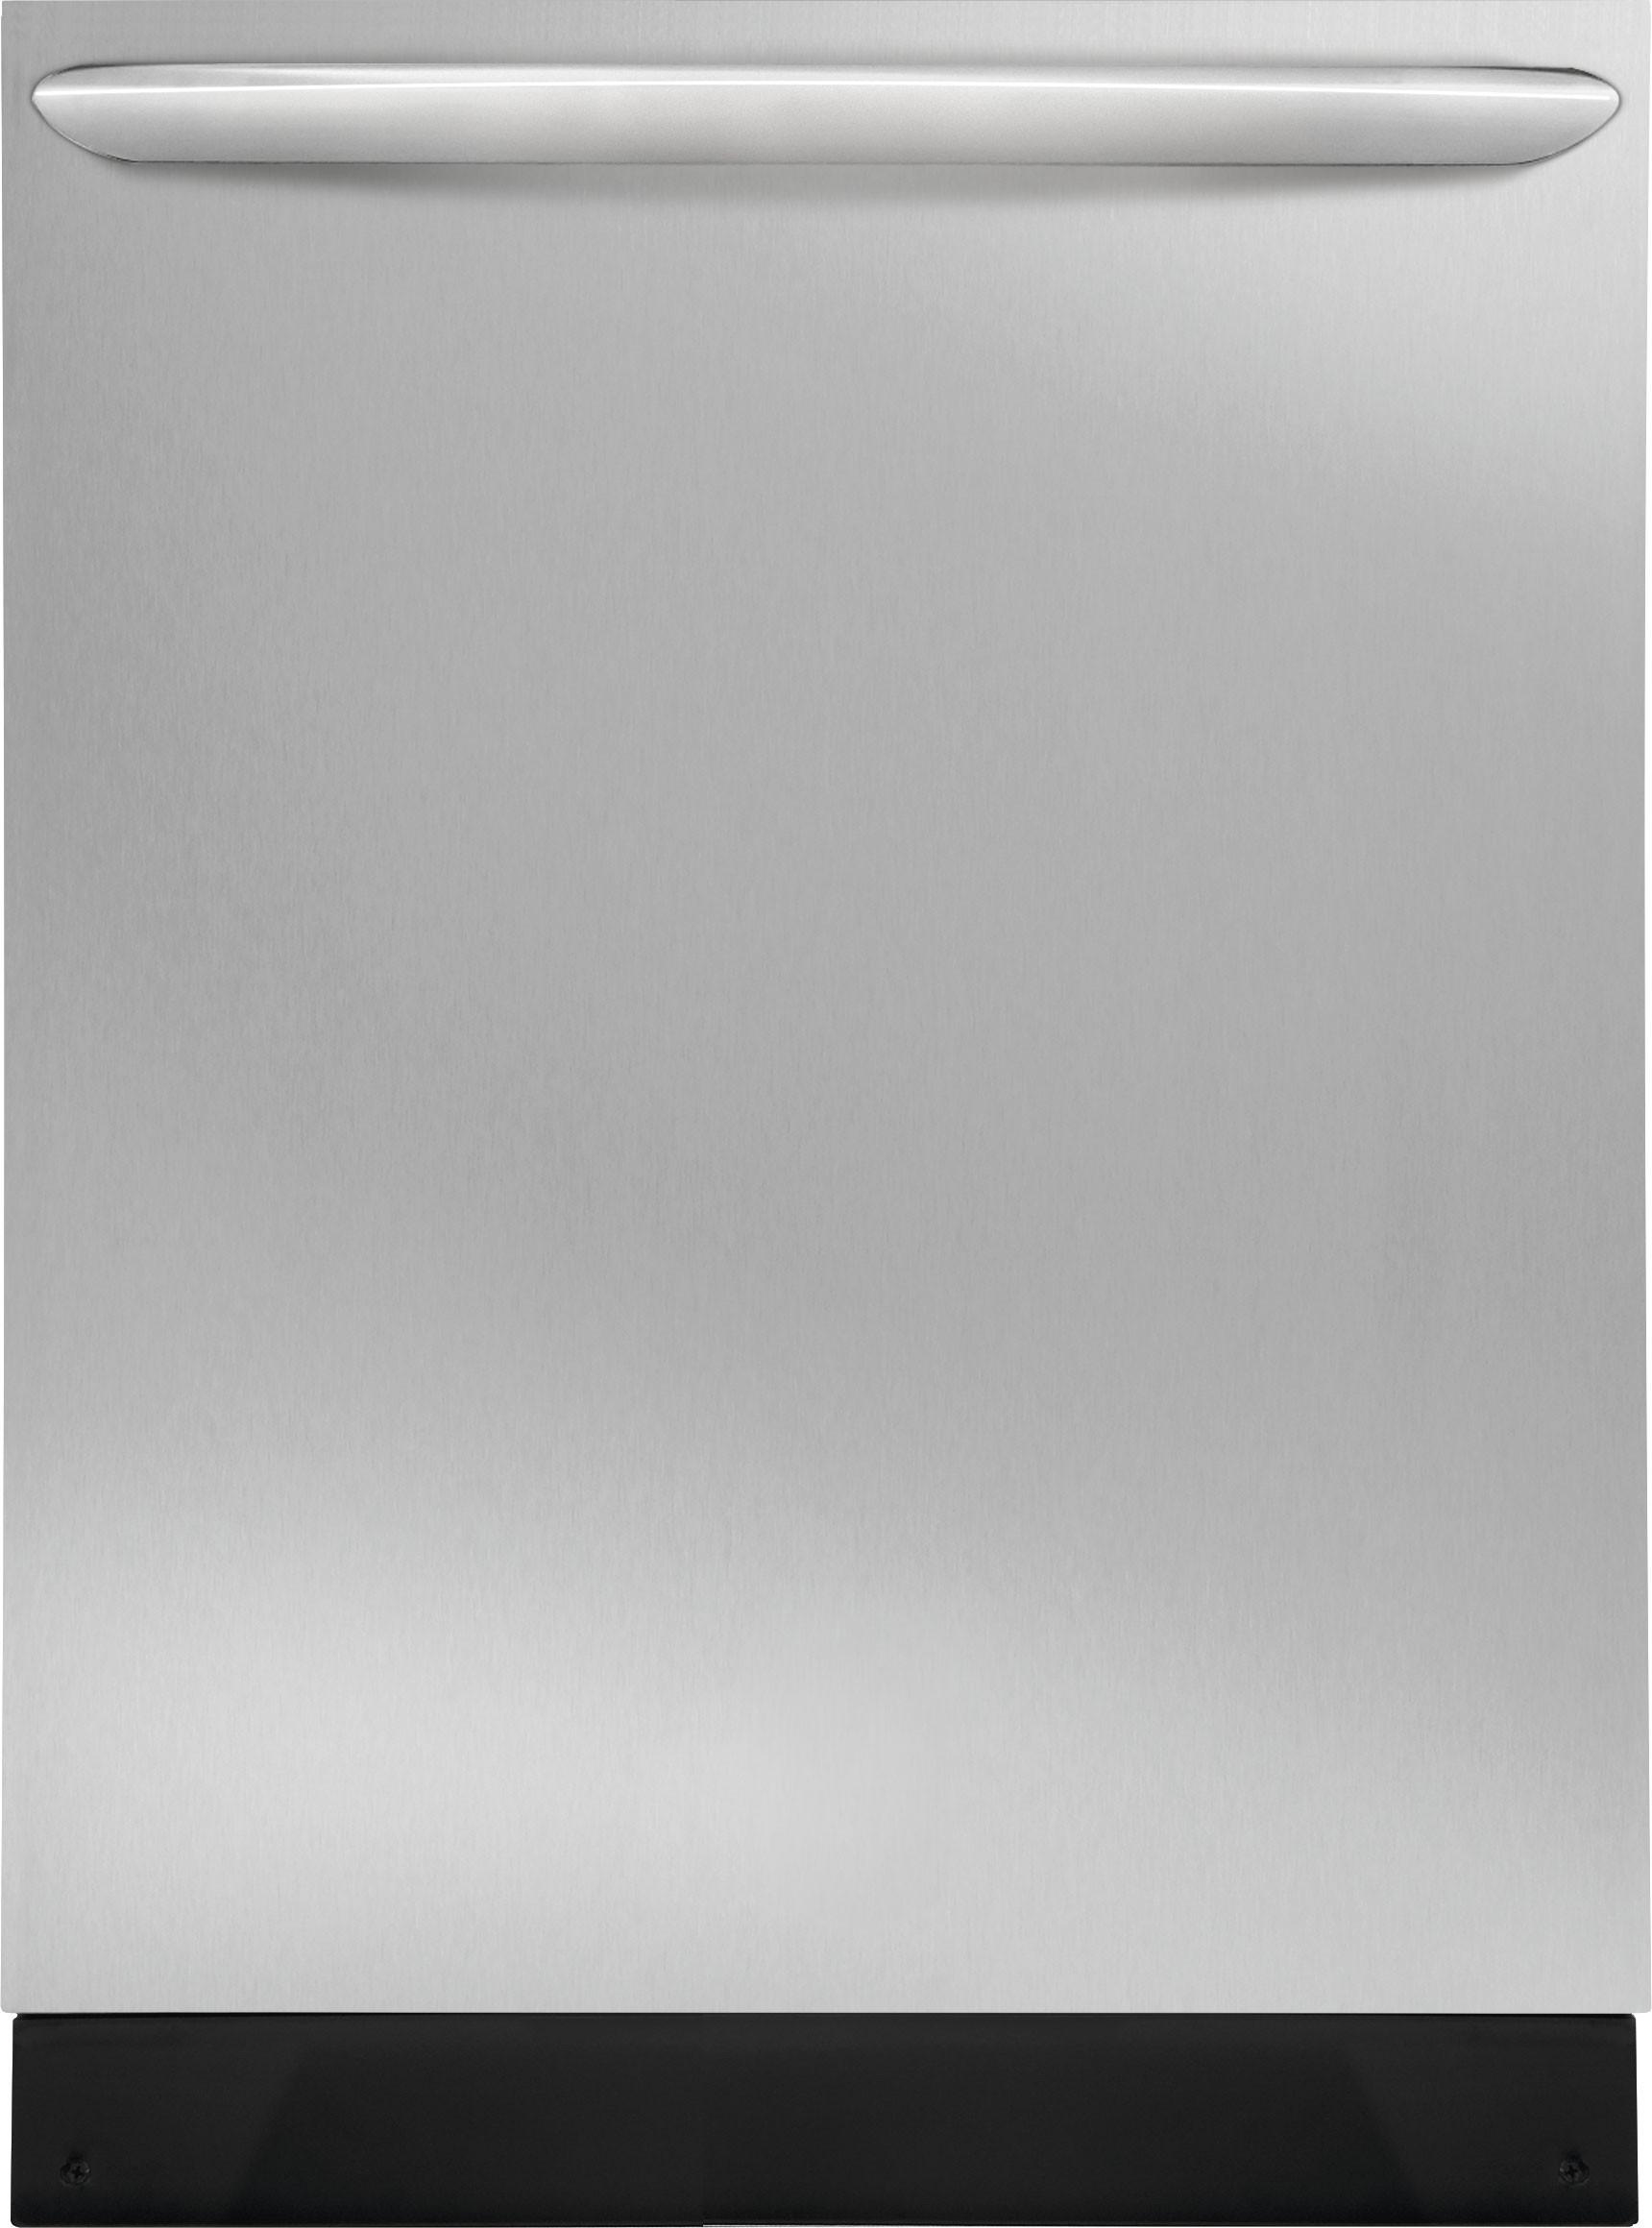 Frigidaire Gallery Series Fgid2466qf Built In Dishwasher